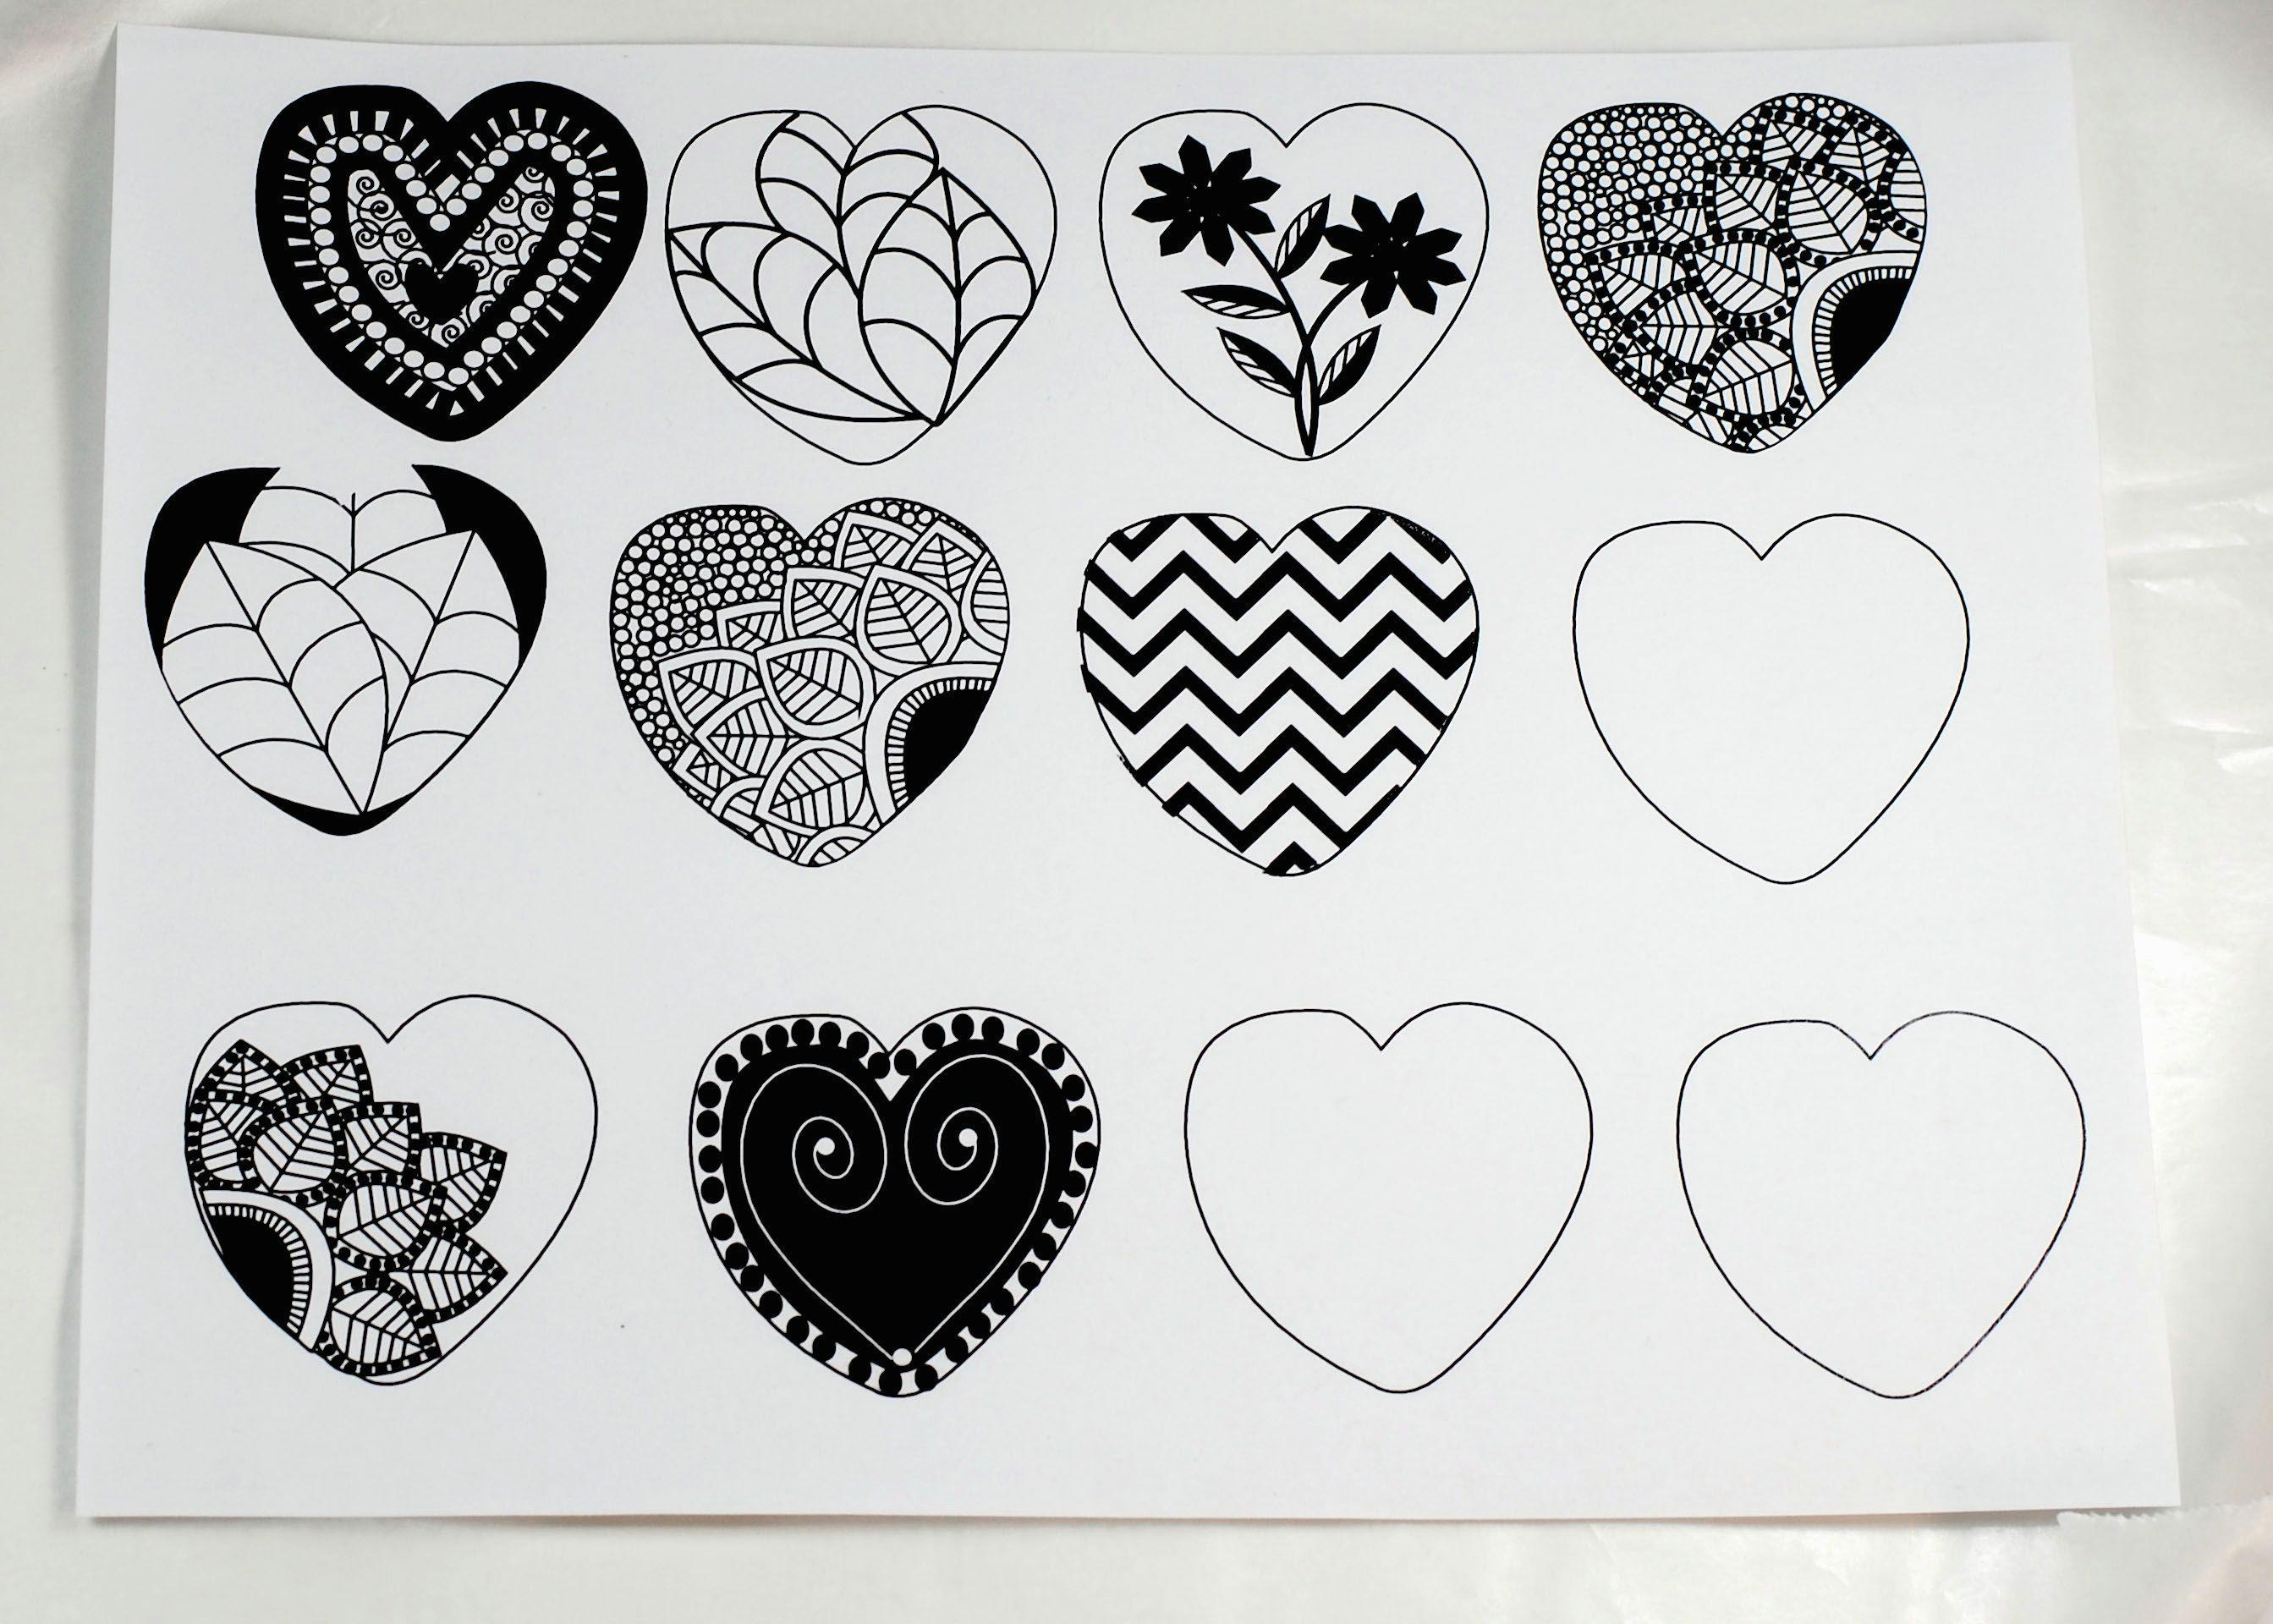 heart drawing 56a6e8dc3df78cf77290e054 jpg